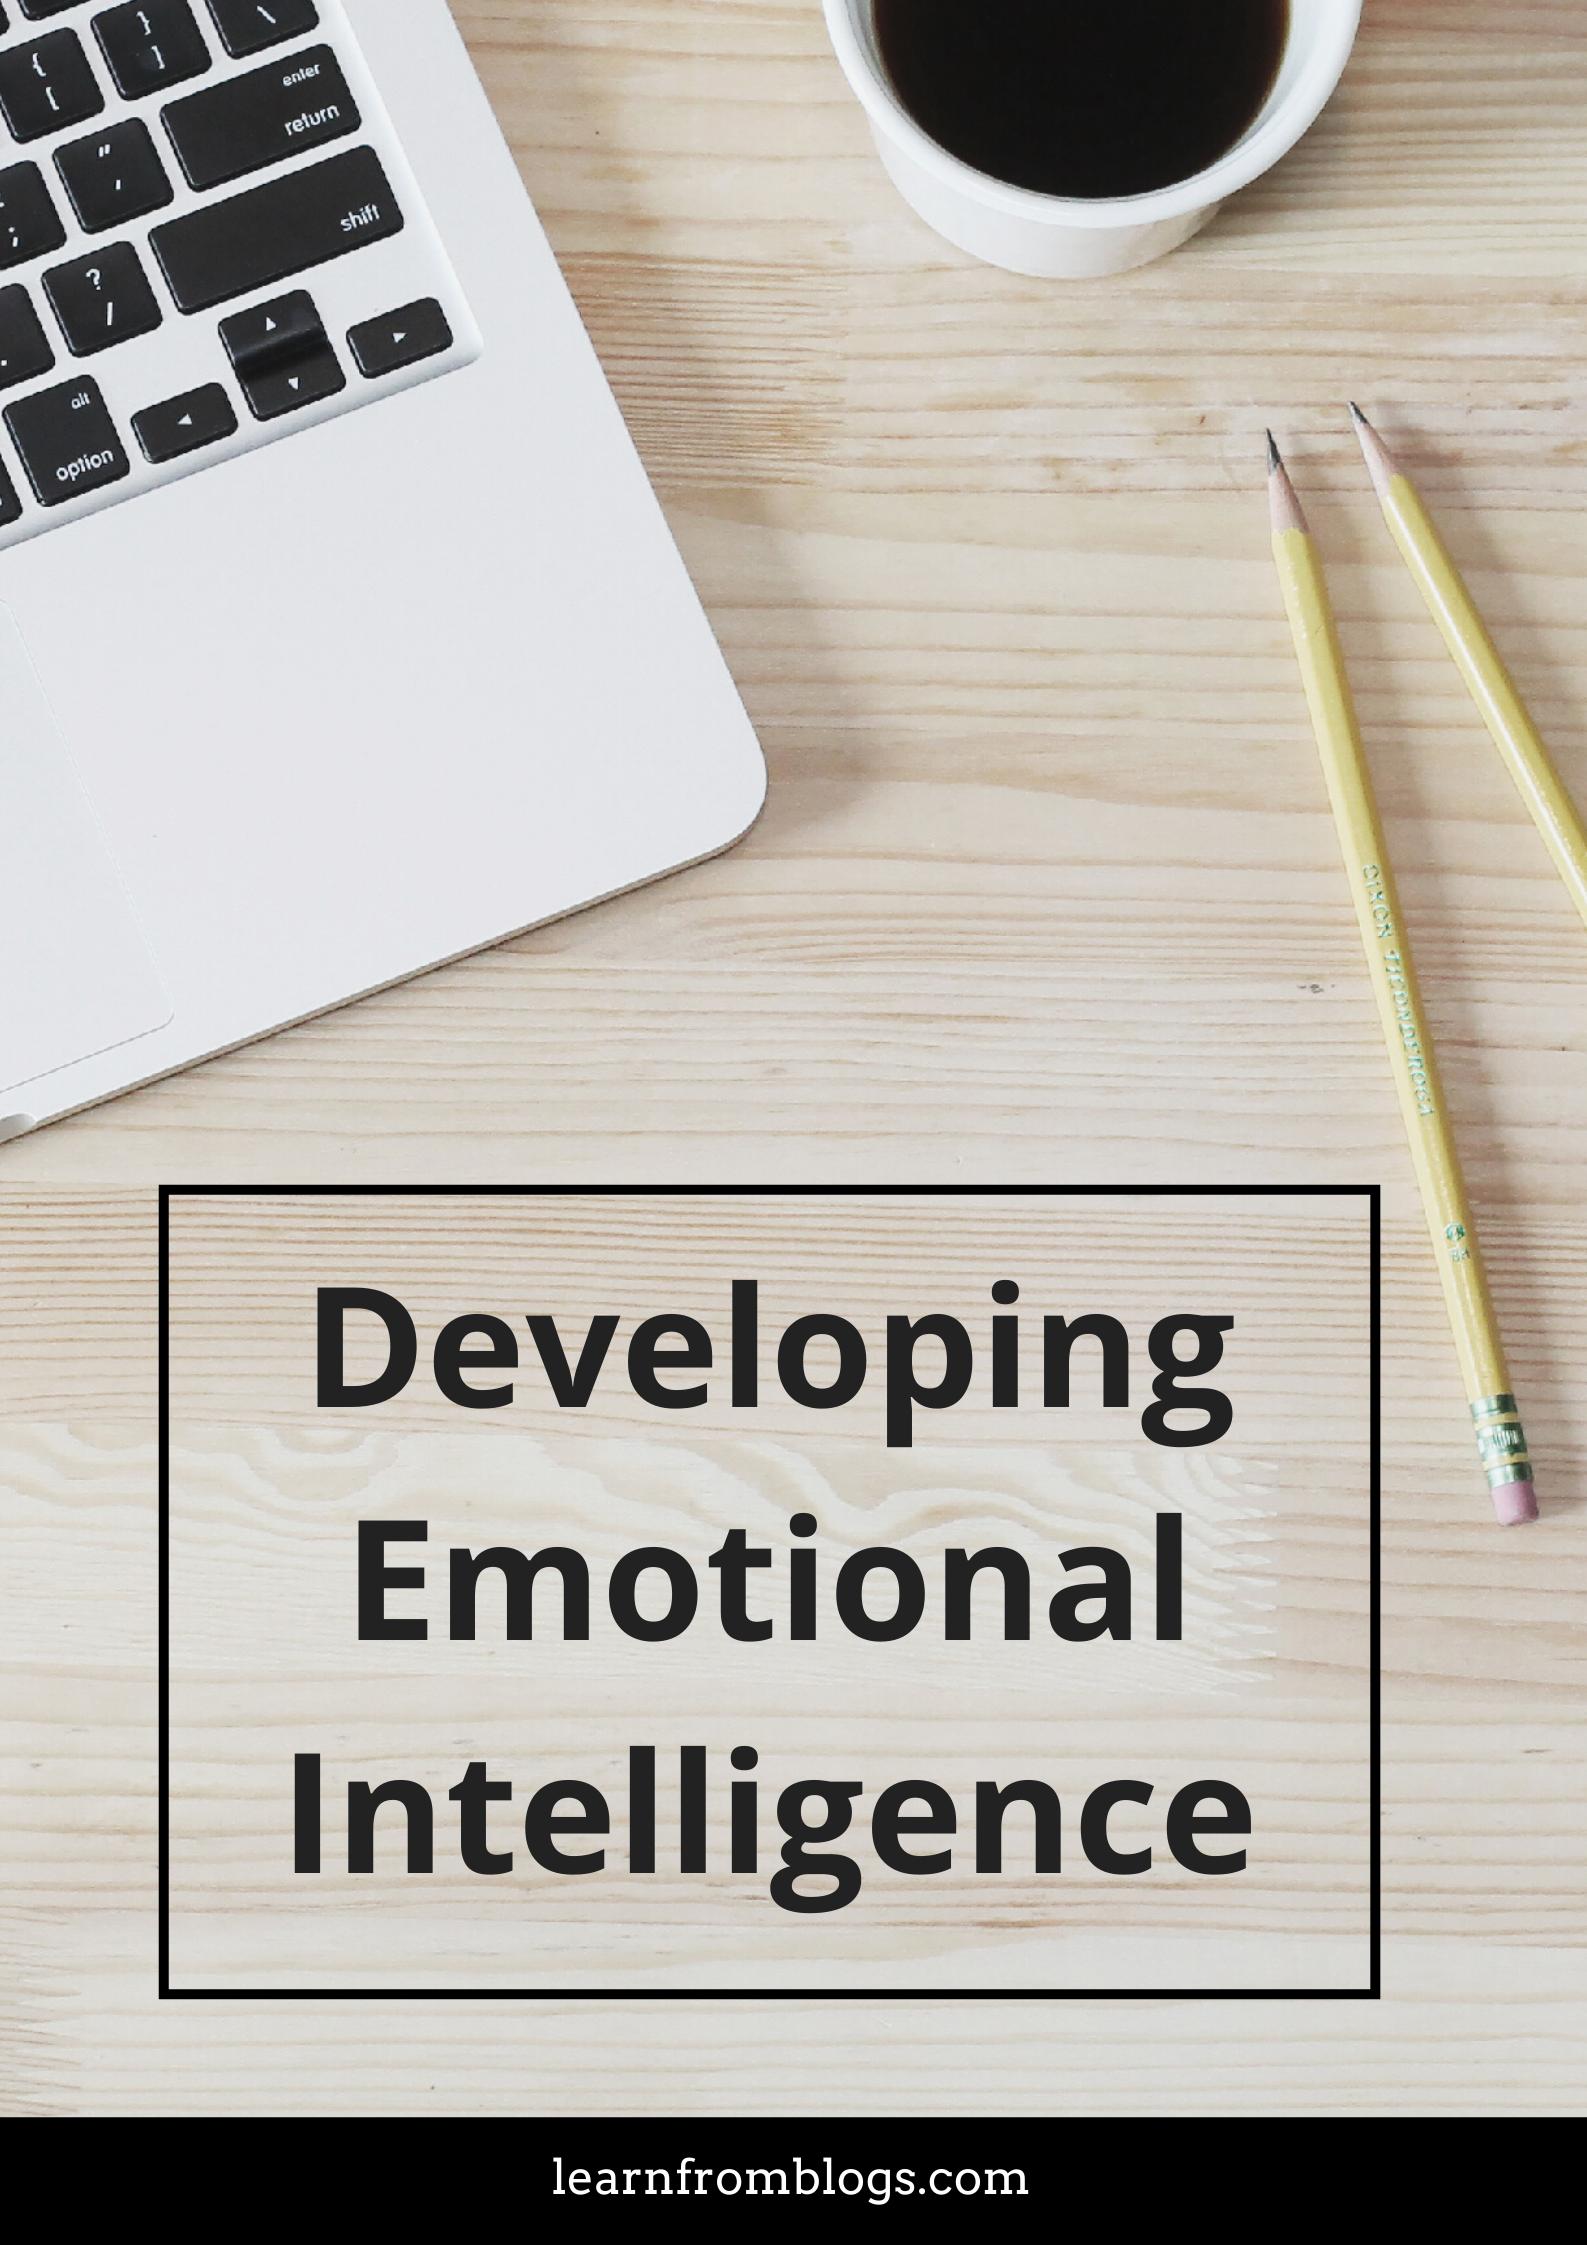 Developing Emotional Intelligence.png